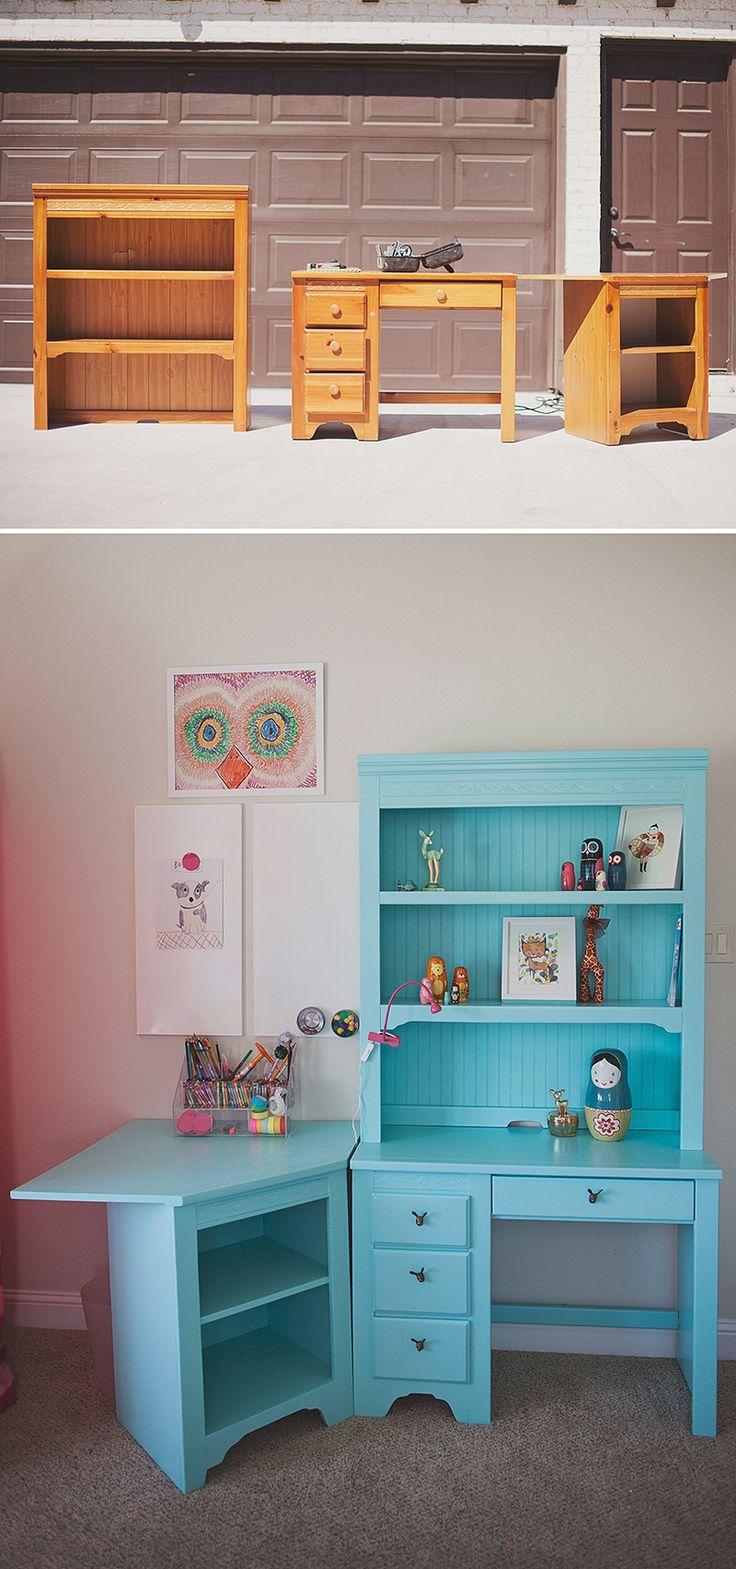 Diy craft room furniture - Find This Pin And More On Diy Furniture Restoration Repurposing